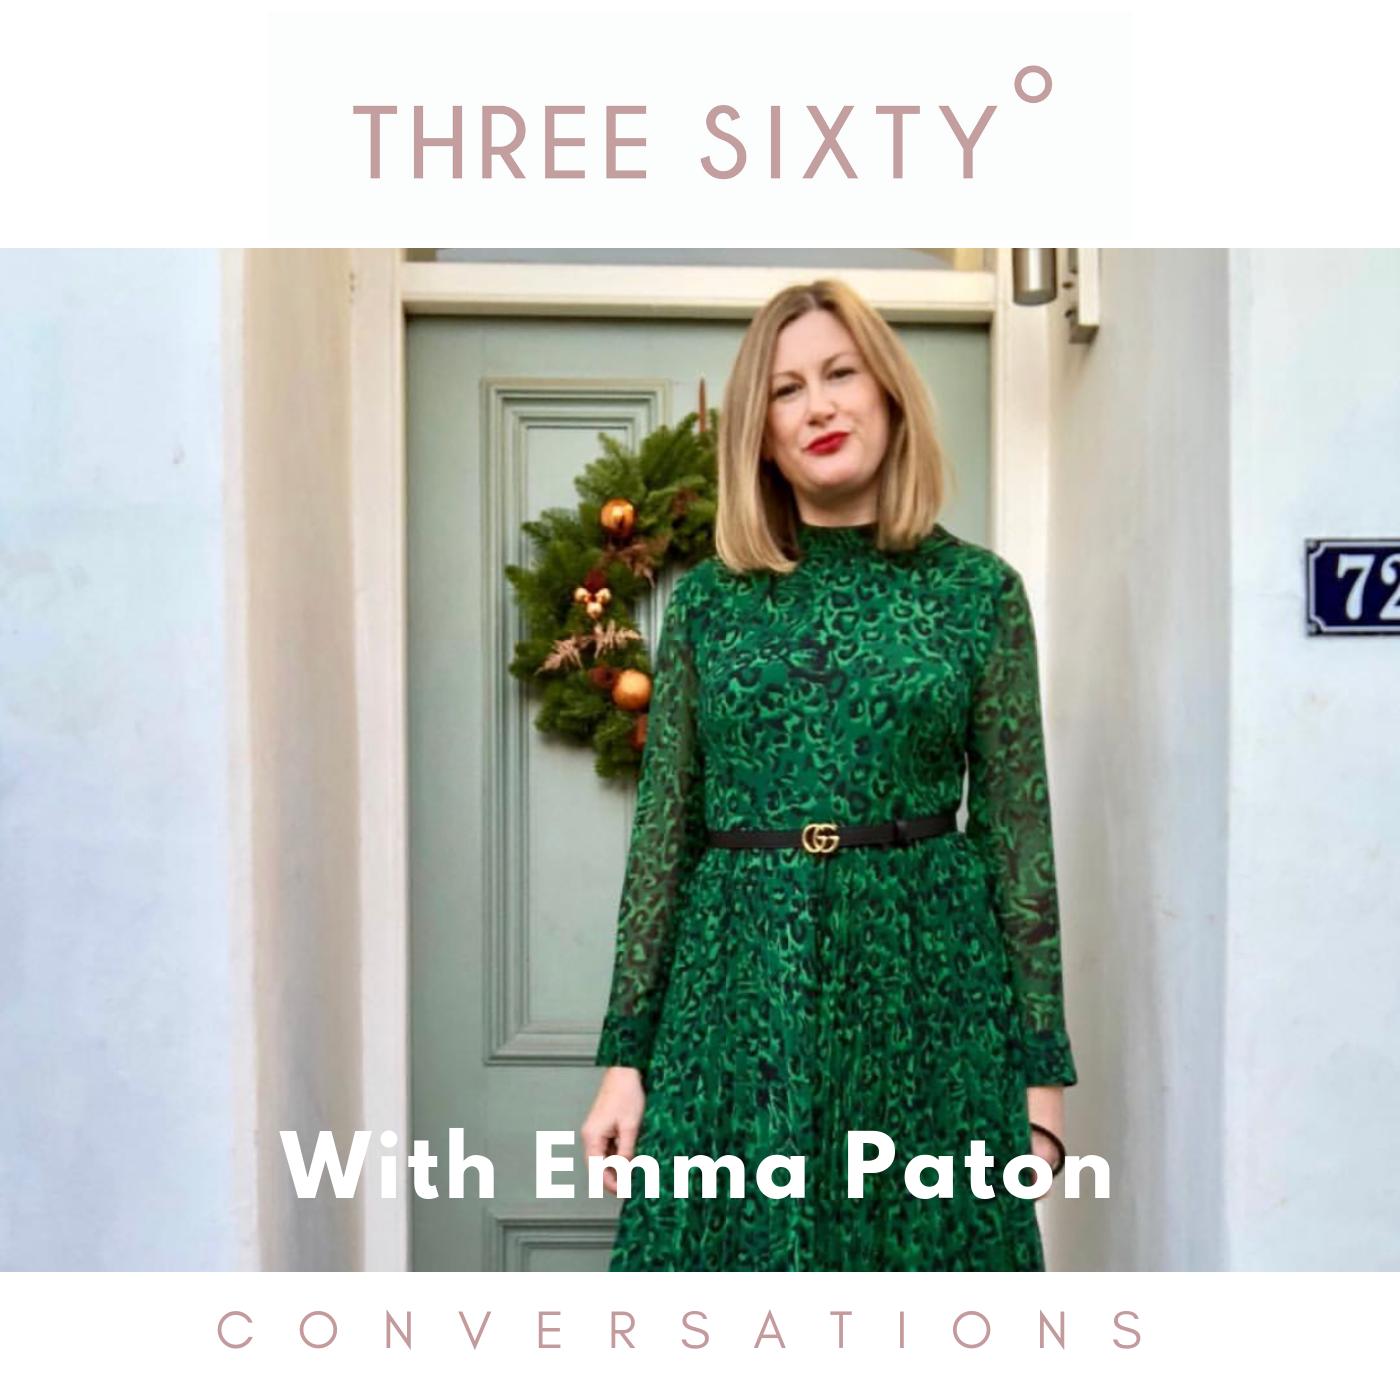 Emma Paton, Finally Fox, Sustainable fashion, guppy bags, shop independent, tamu Thomas, live three sixty, fashion revolution, everyday joy